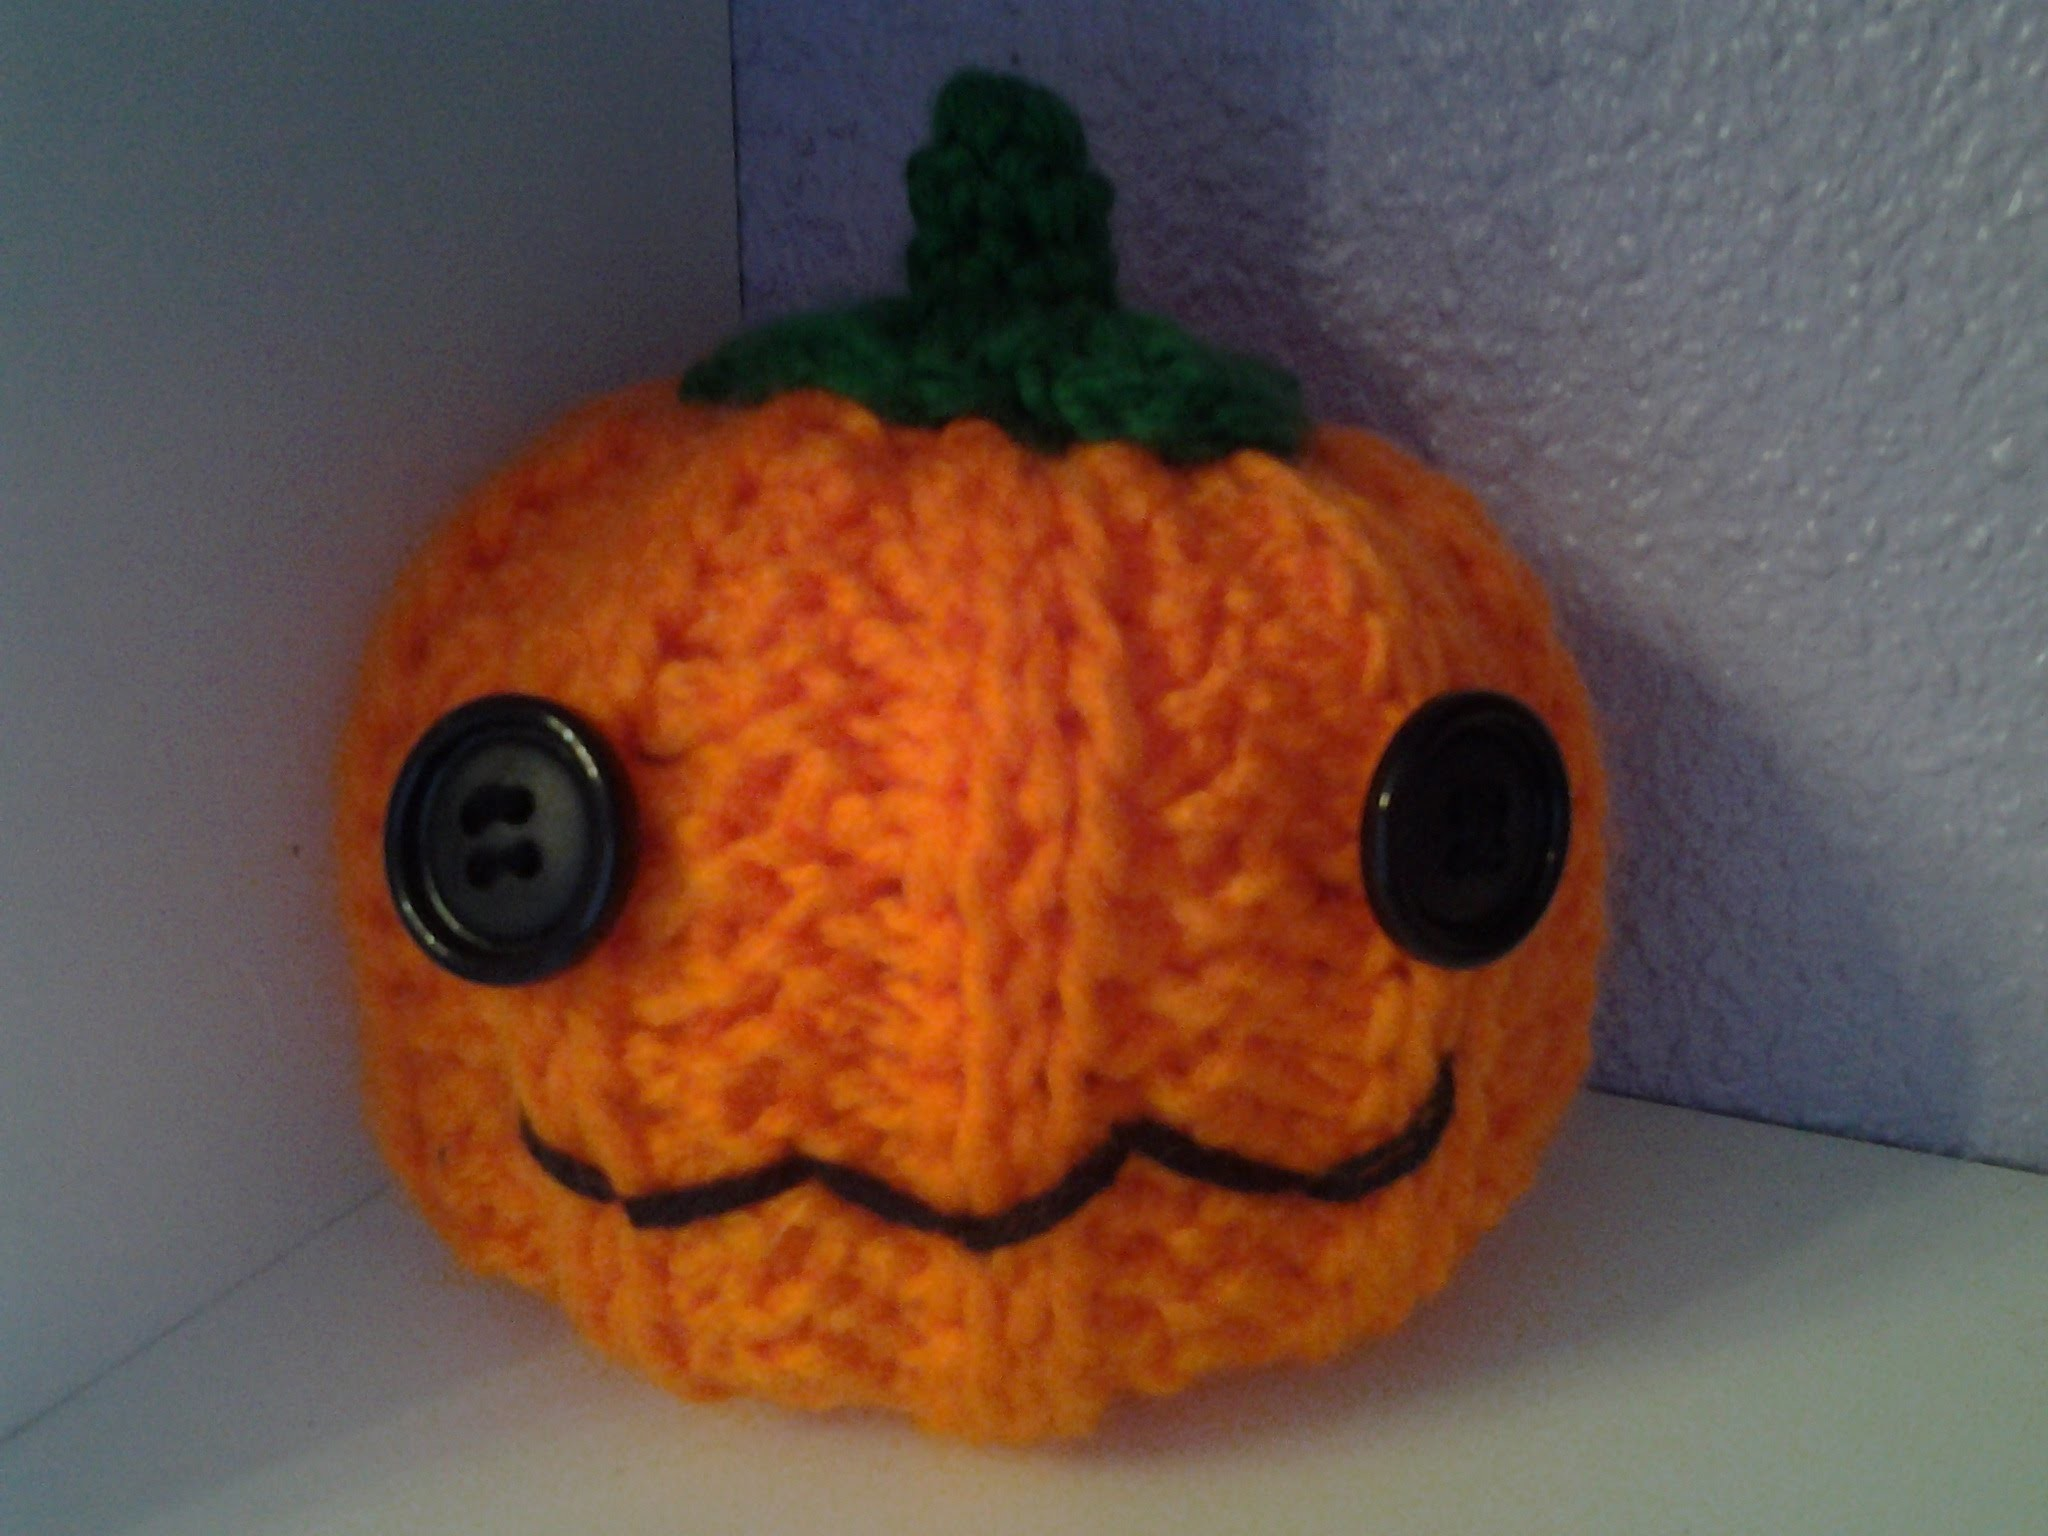 Calabaza hallowen boo! crochet (ganchillo) tunecino #tutorial DIY